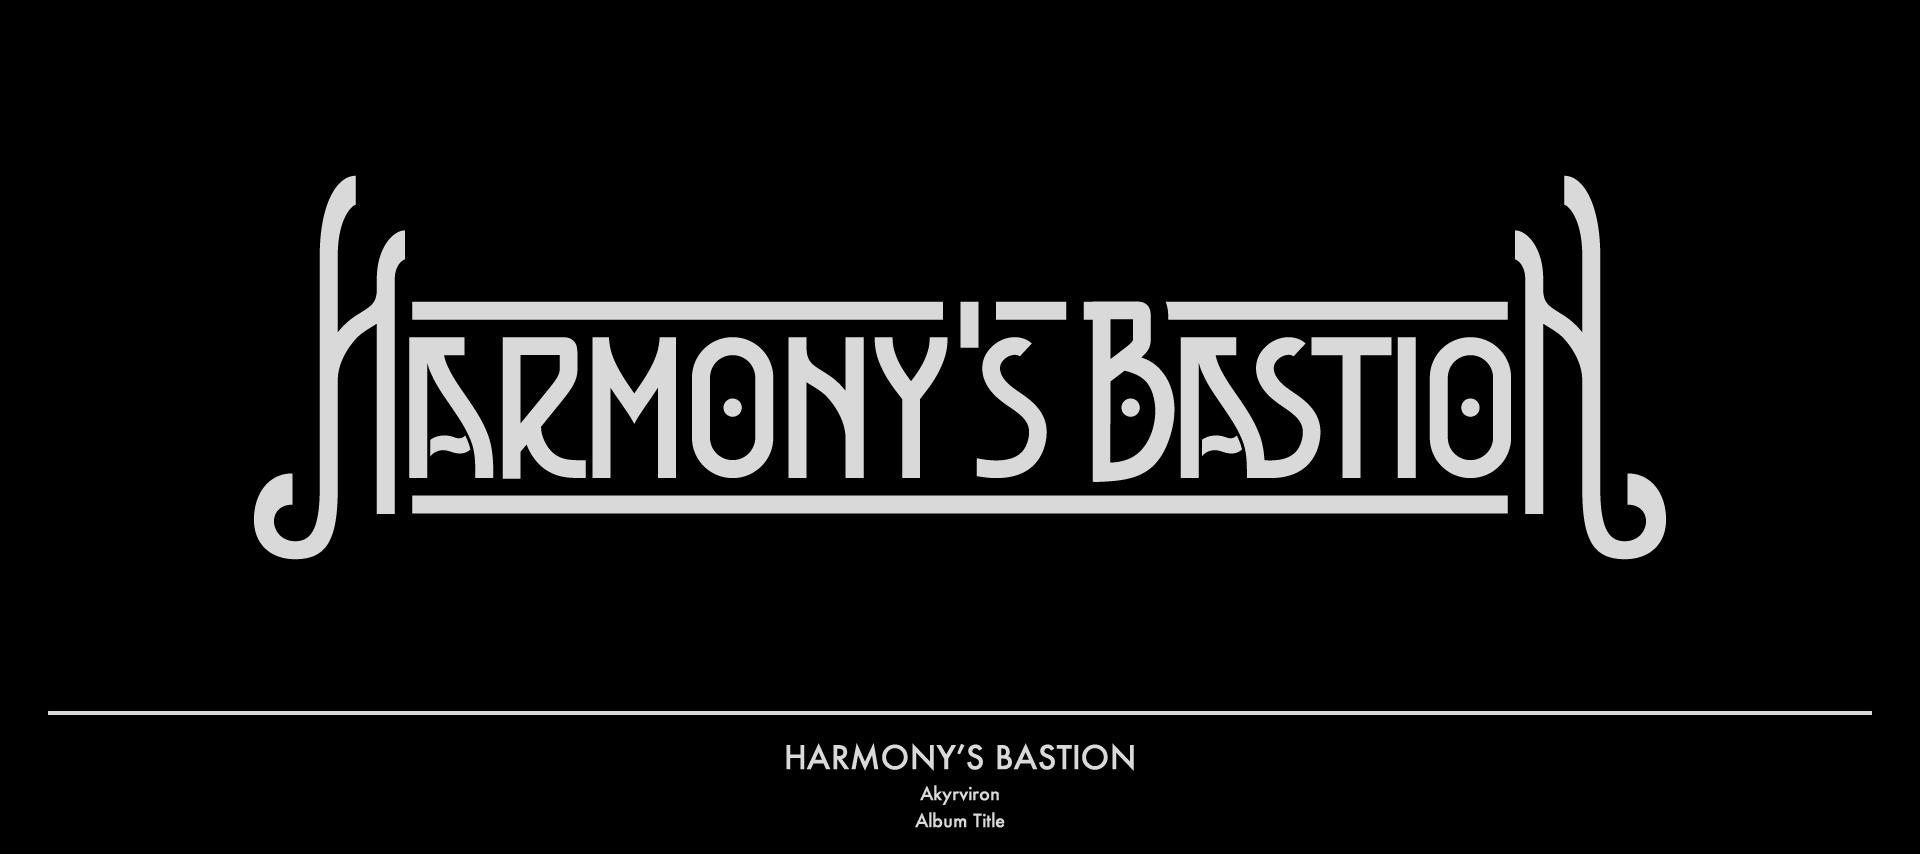 Harmonys_Bastion.jpg